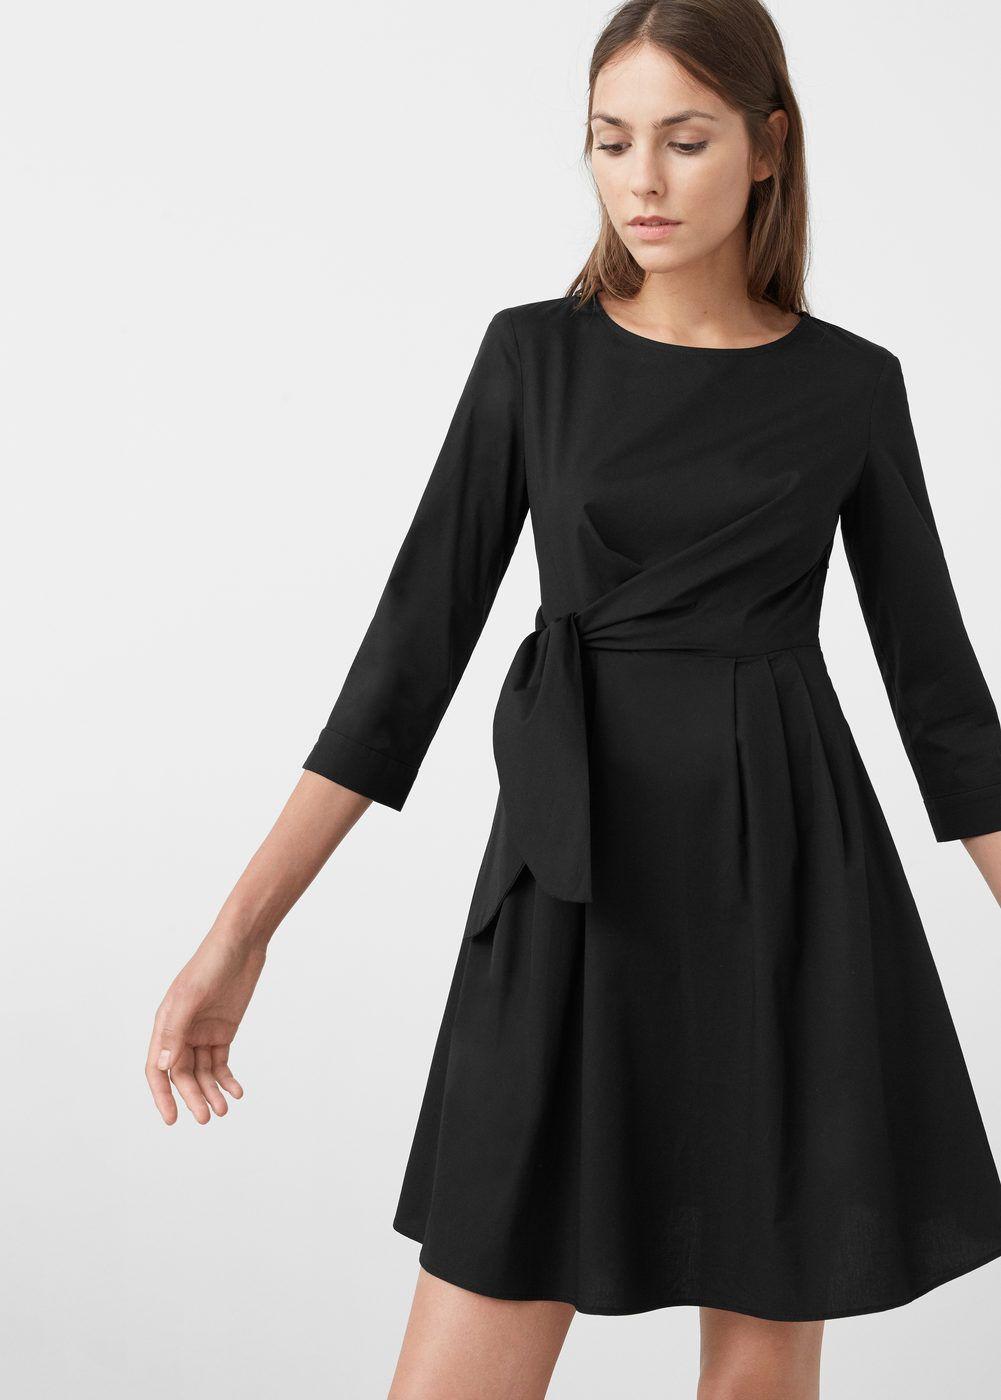 Poplin dress - Women in 2018   FASHION RULES   Pinterest   Dresses ... 14513b9fd2